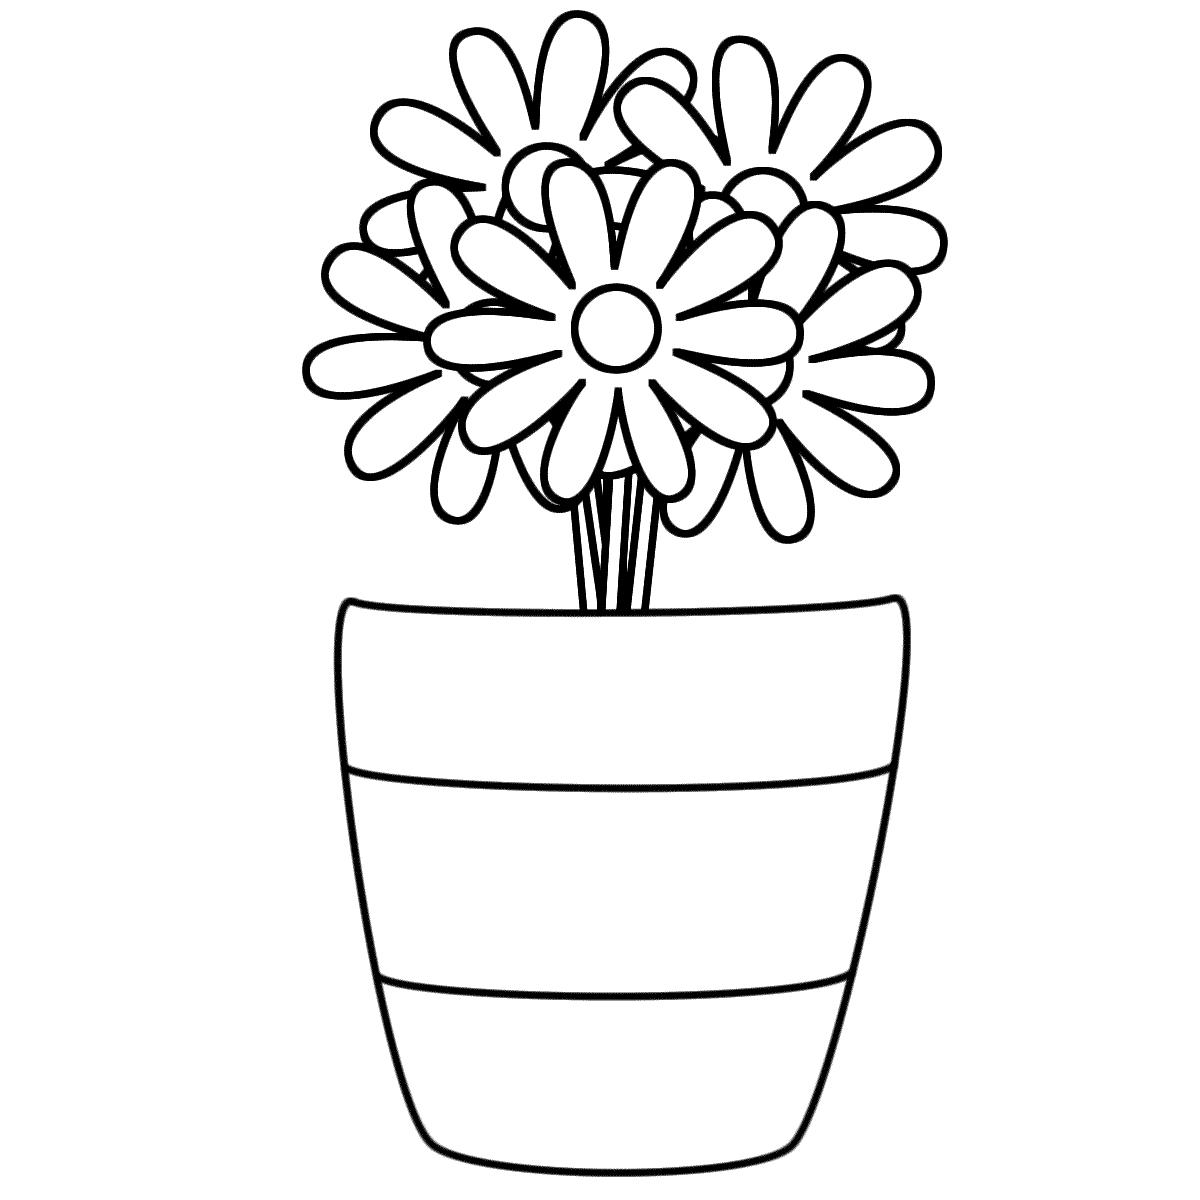 vase line drawing at getdrawings com free for personal use vase rh getdrawings com